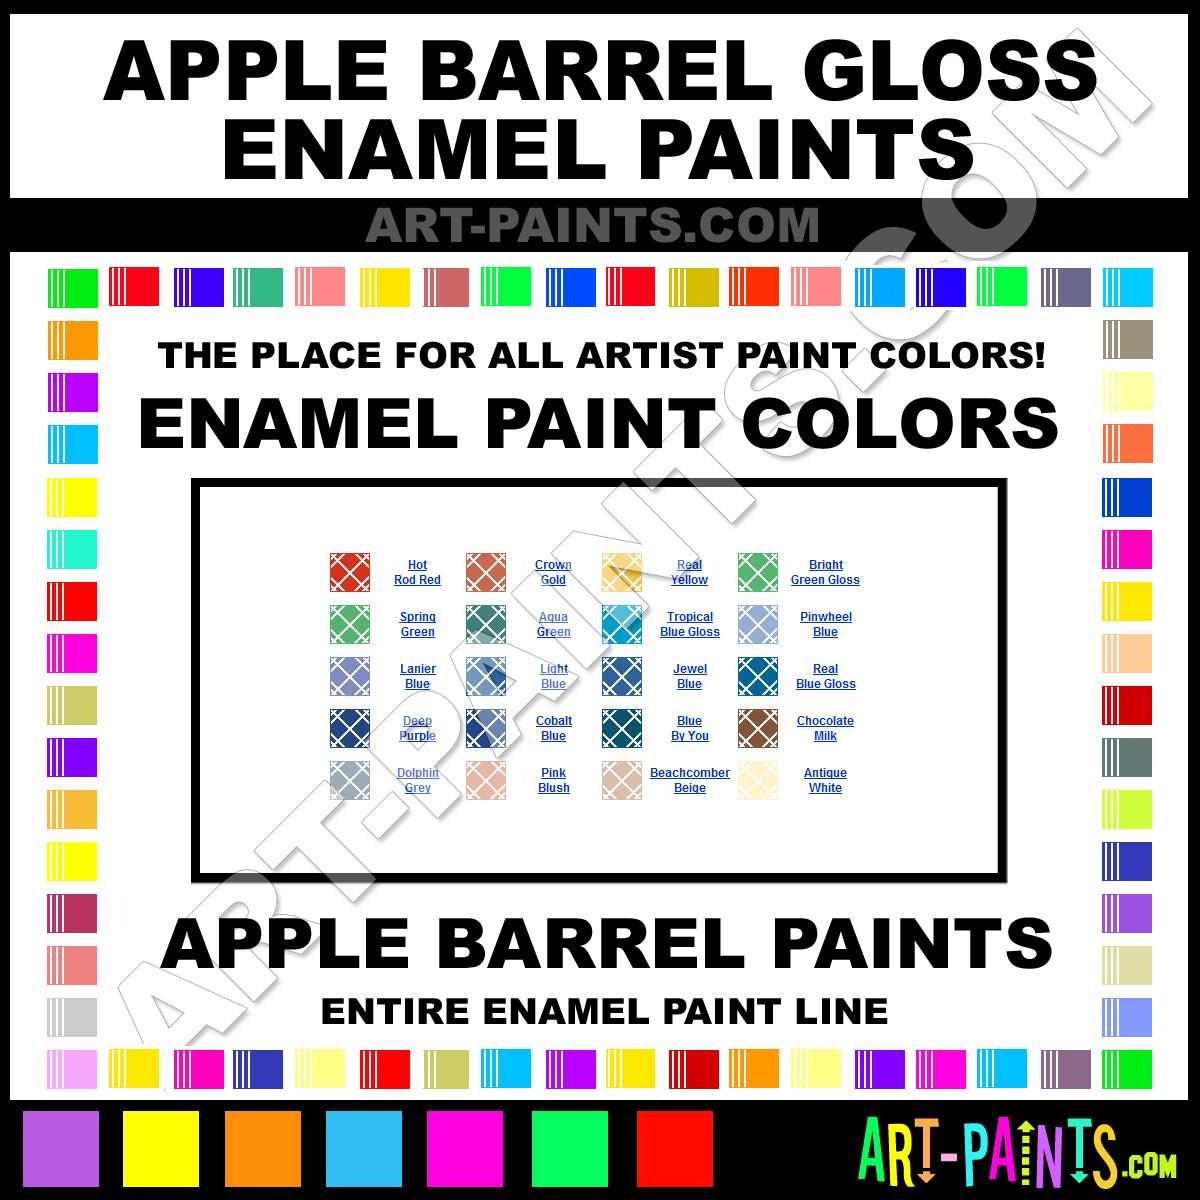 Apple Barrel Gloss Enamel Paint Colors